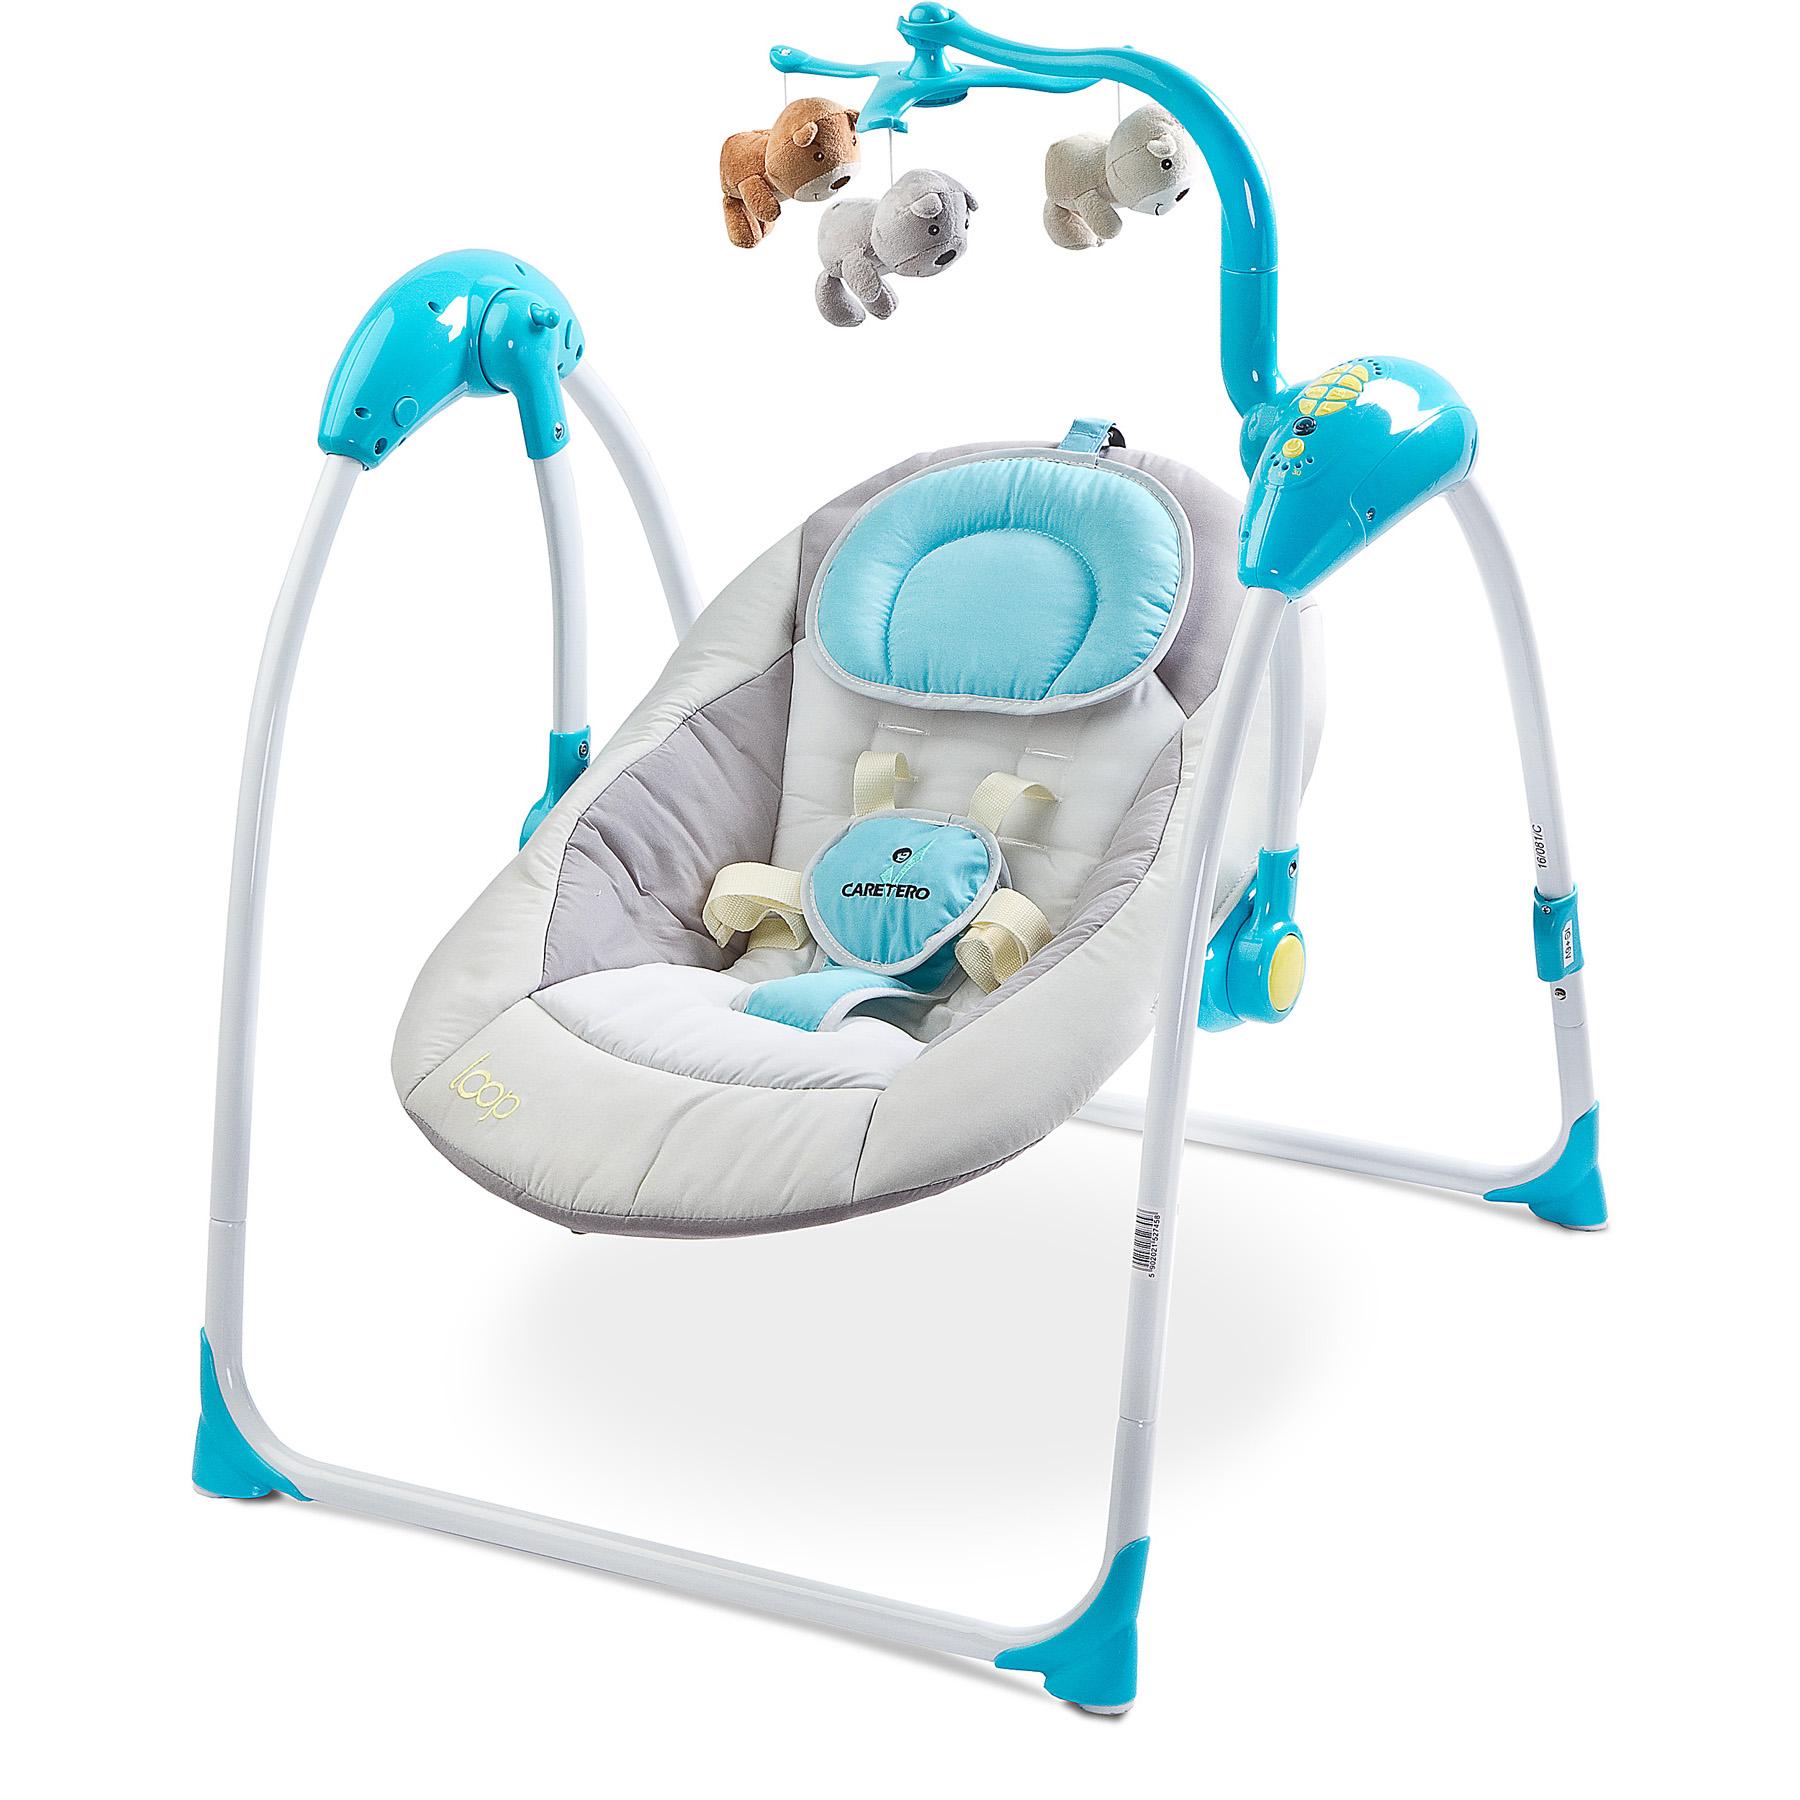 Elektrische Babywippe Babyschaukel Babysitz Wippe Schaukel LOOP BLUE ...